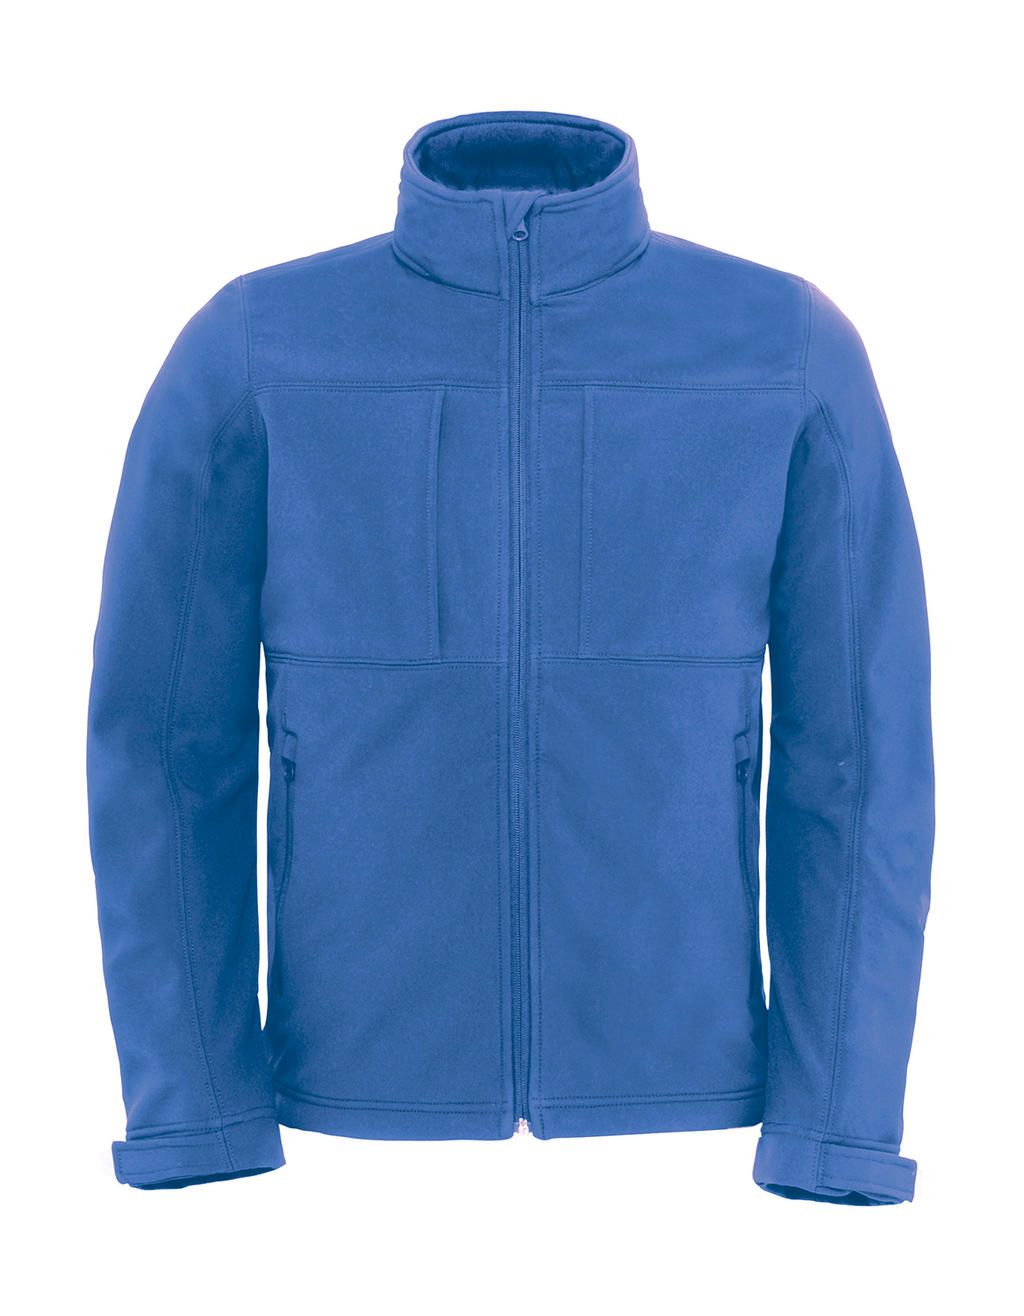 Pánská bunda Softshell Hooded Softshell/men - zvìtšit obrázek